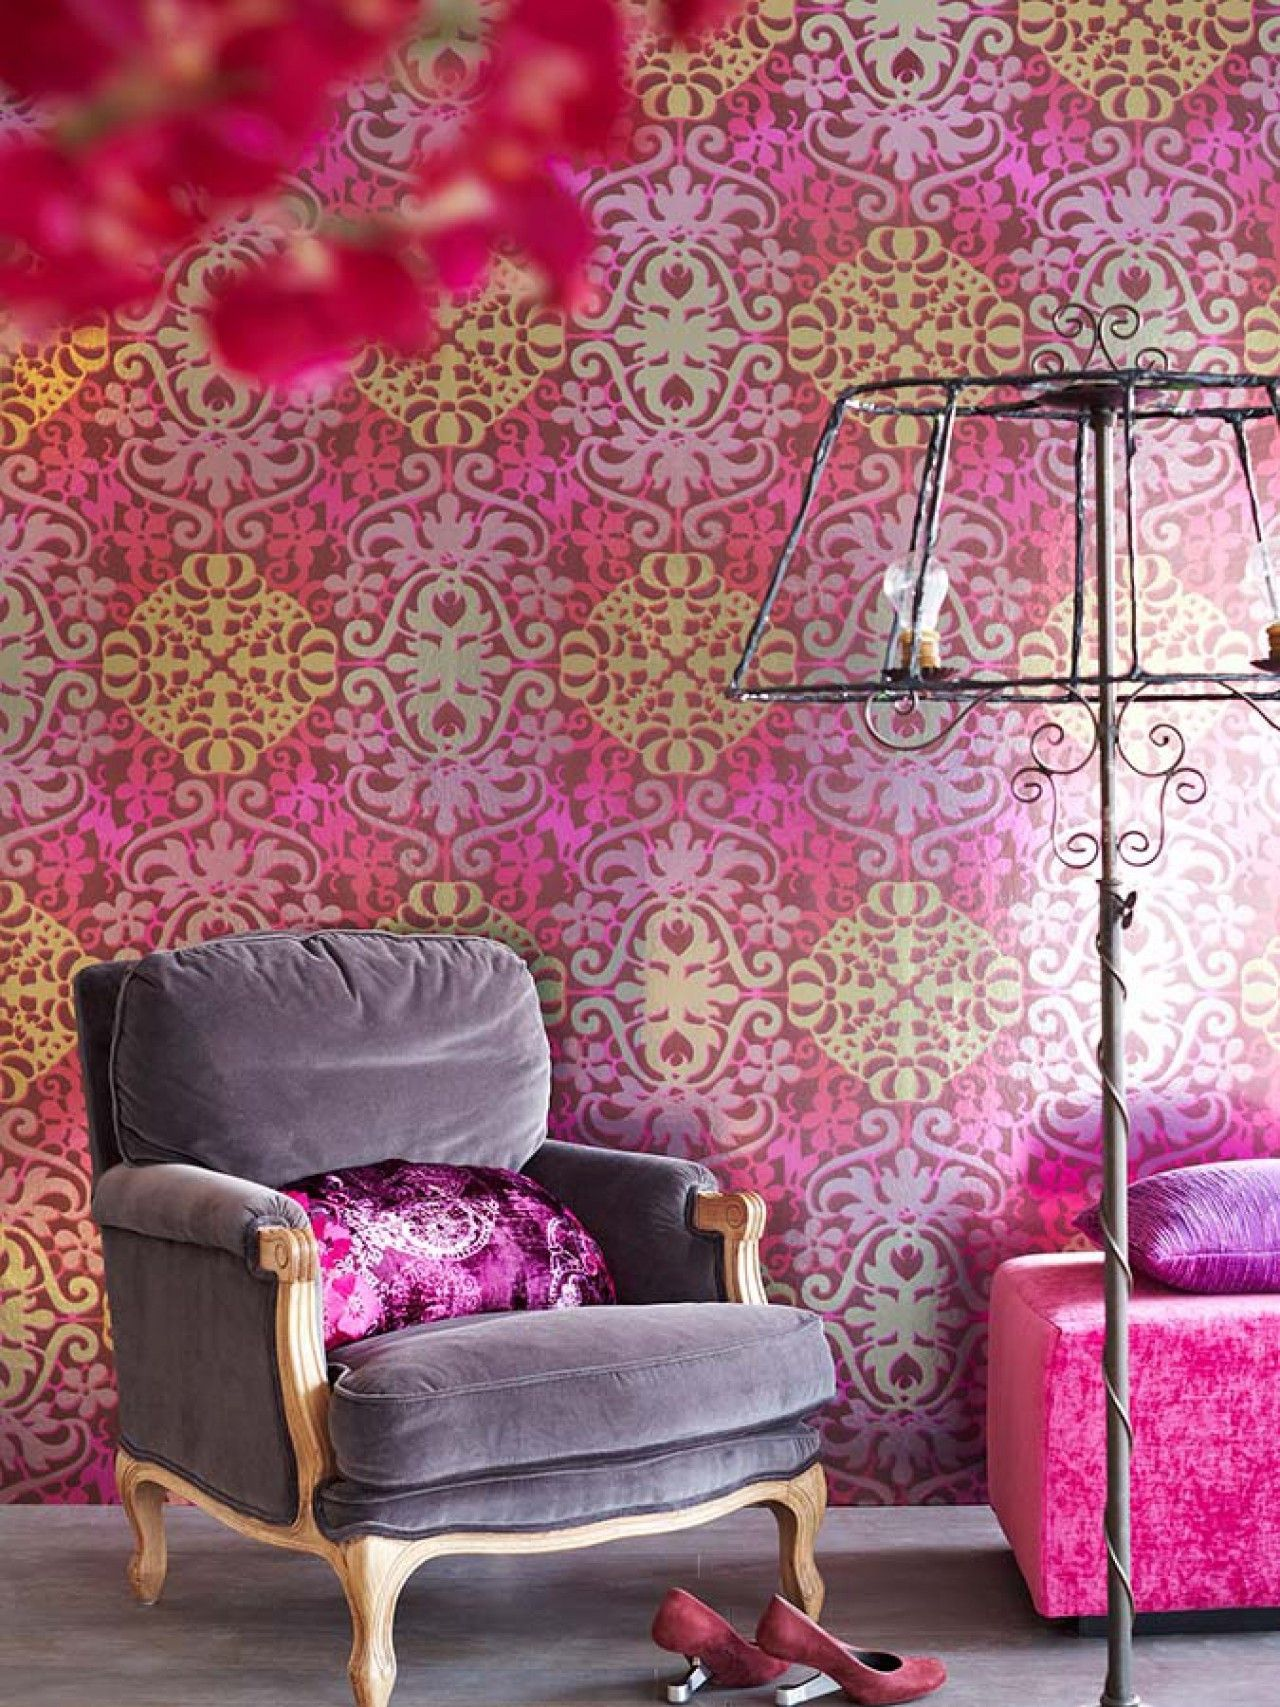 venetian dreams tendances de papiers peints lookbook. Black Bedroom Furniture Sets. Home Design Ideas